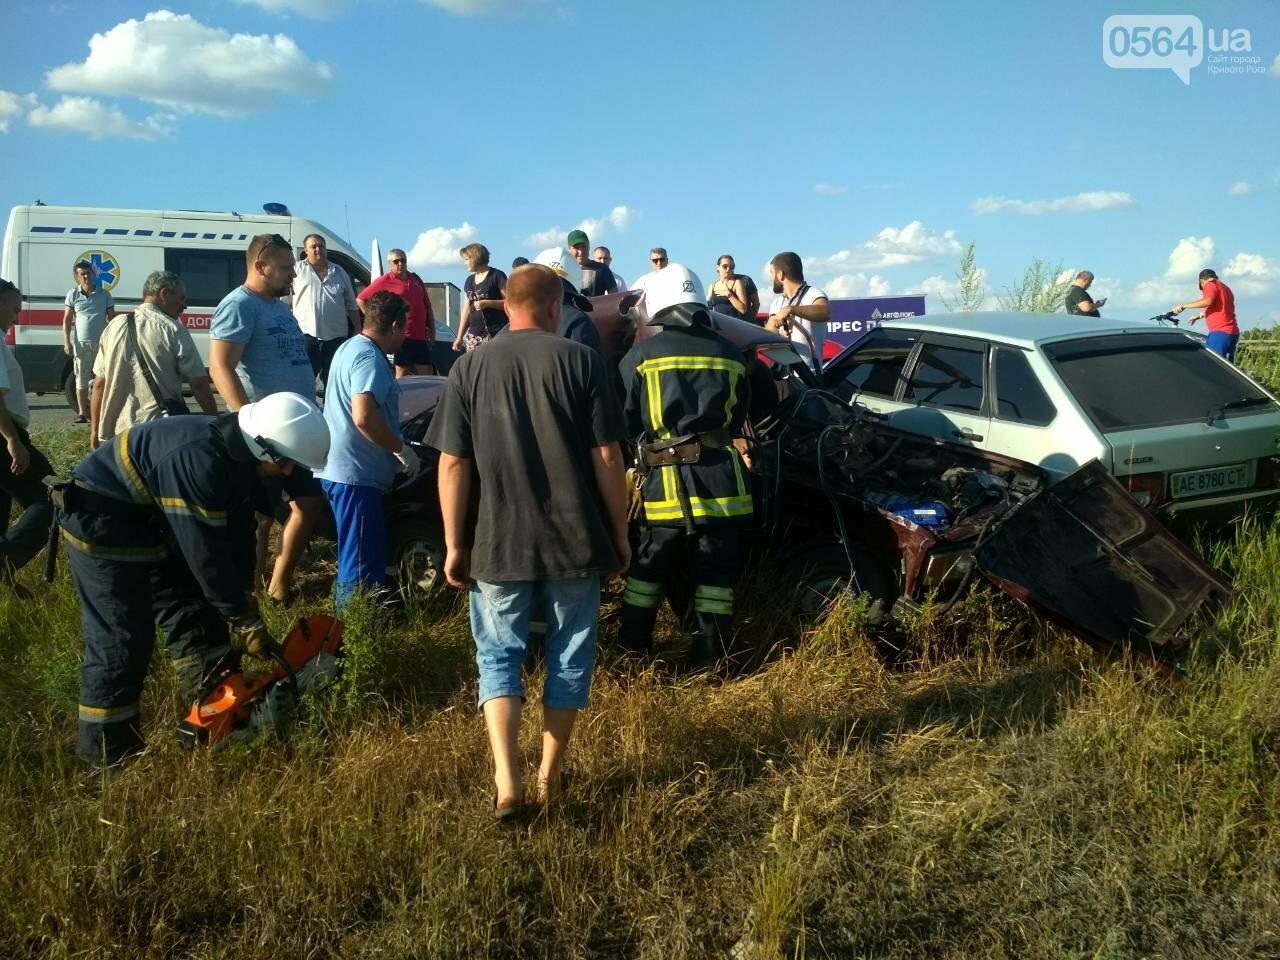 На Днепропетровщине столкнулись маршрутка и 2 легковушки. Один человек погиб, - ФОТО, фото-3